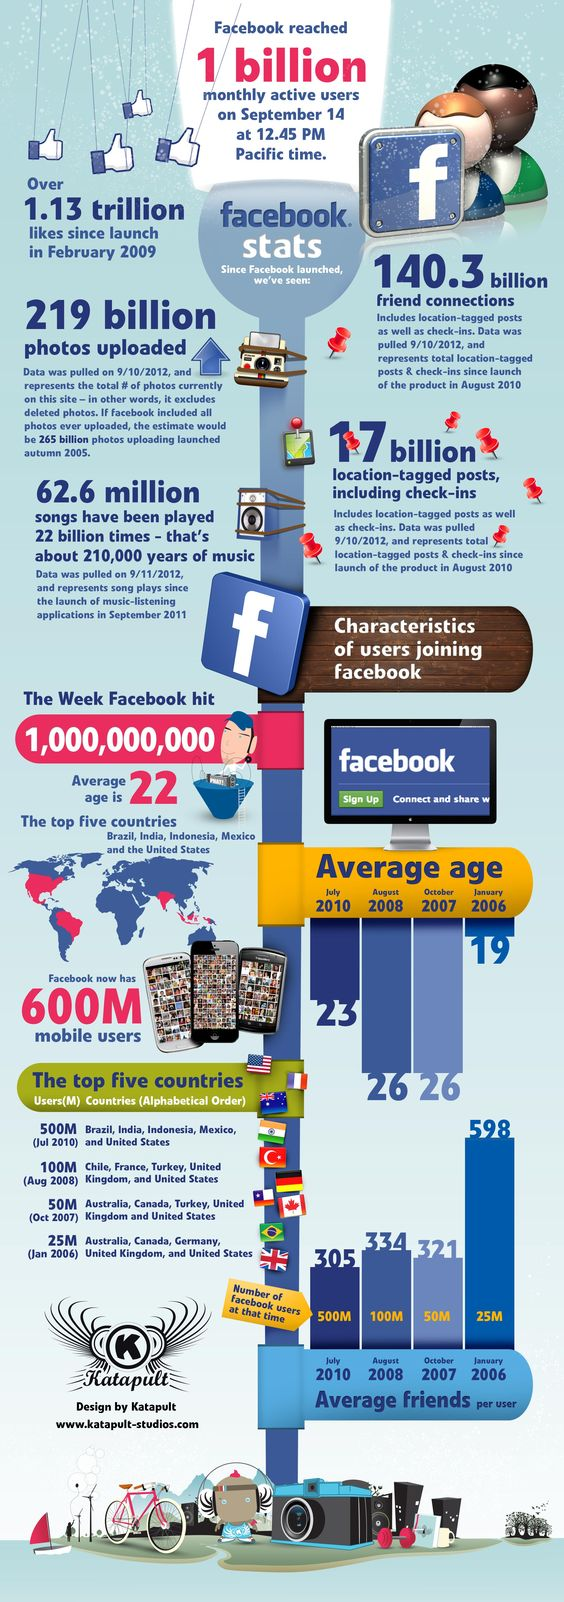 Los 1.000.000.000 de usuarios de FaceBook #infografia #infographic #socialmedia